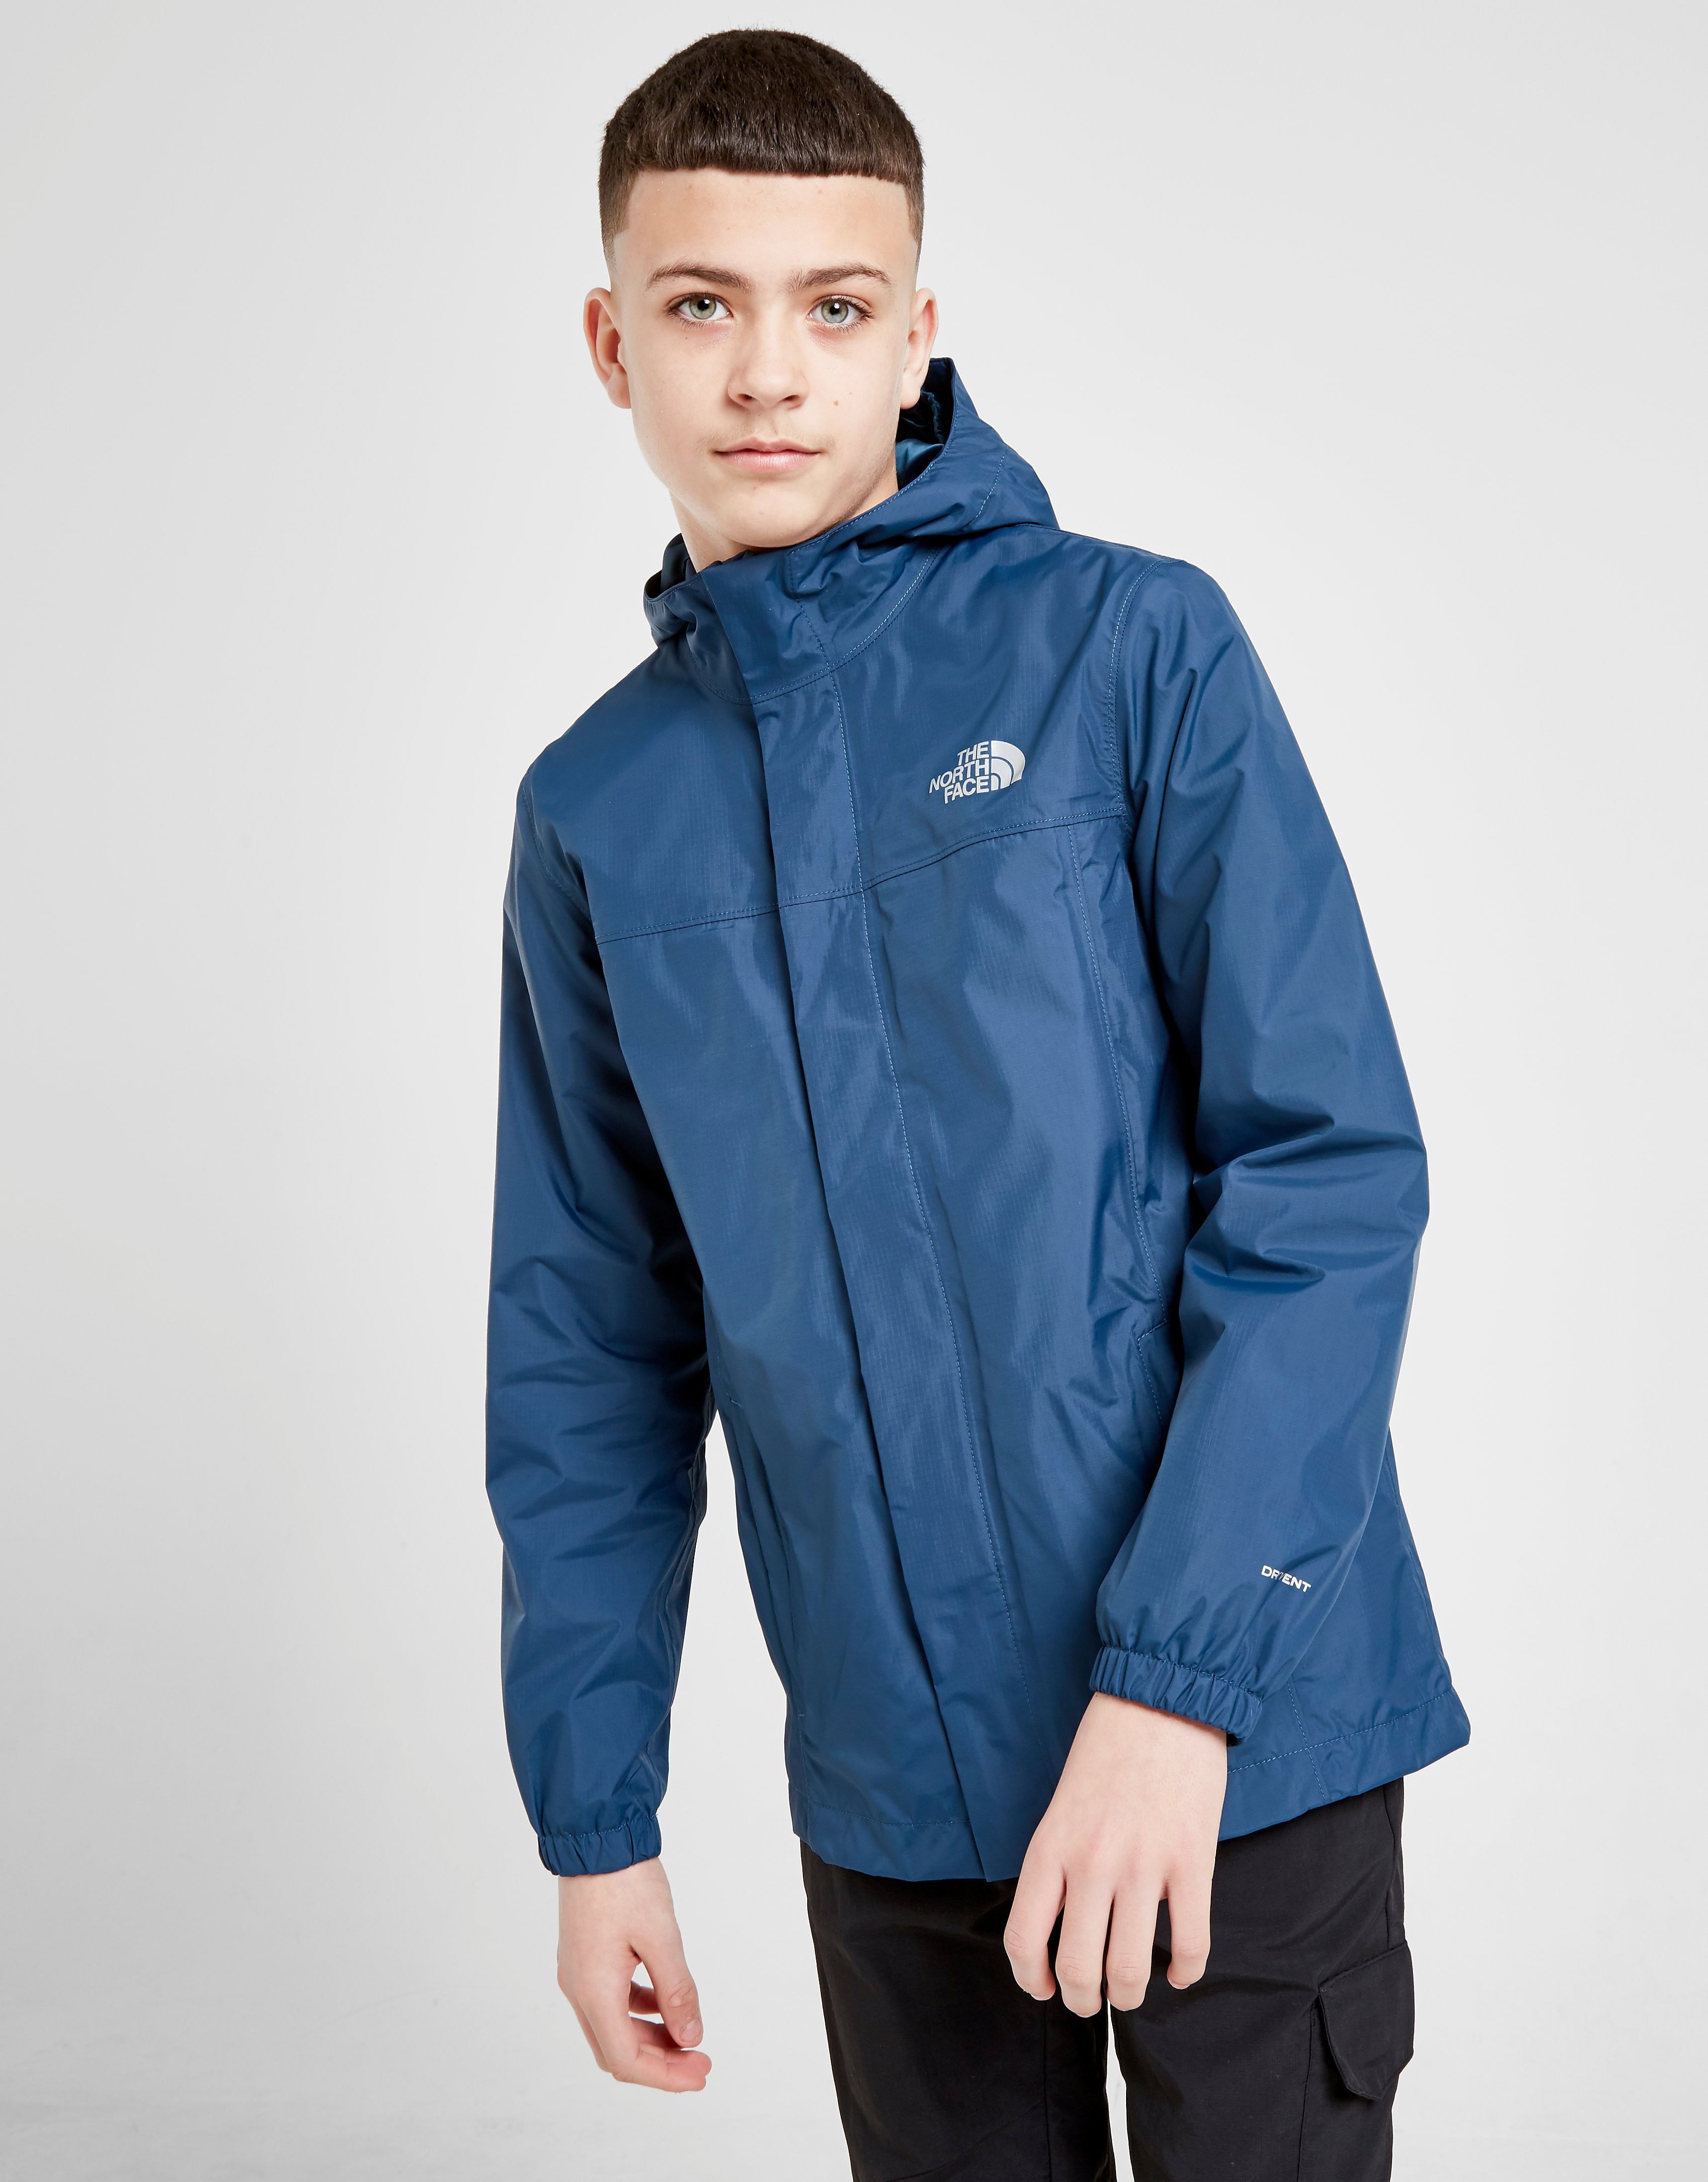 The North Face Resolve Jacket Junior Blauw Kind Blauw